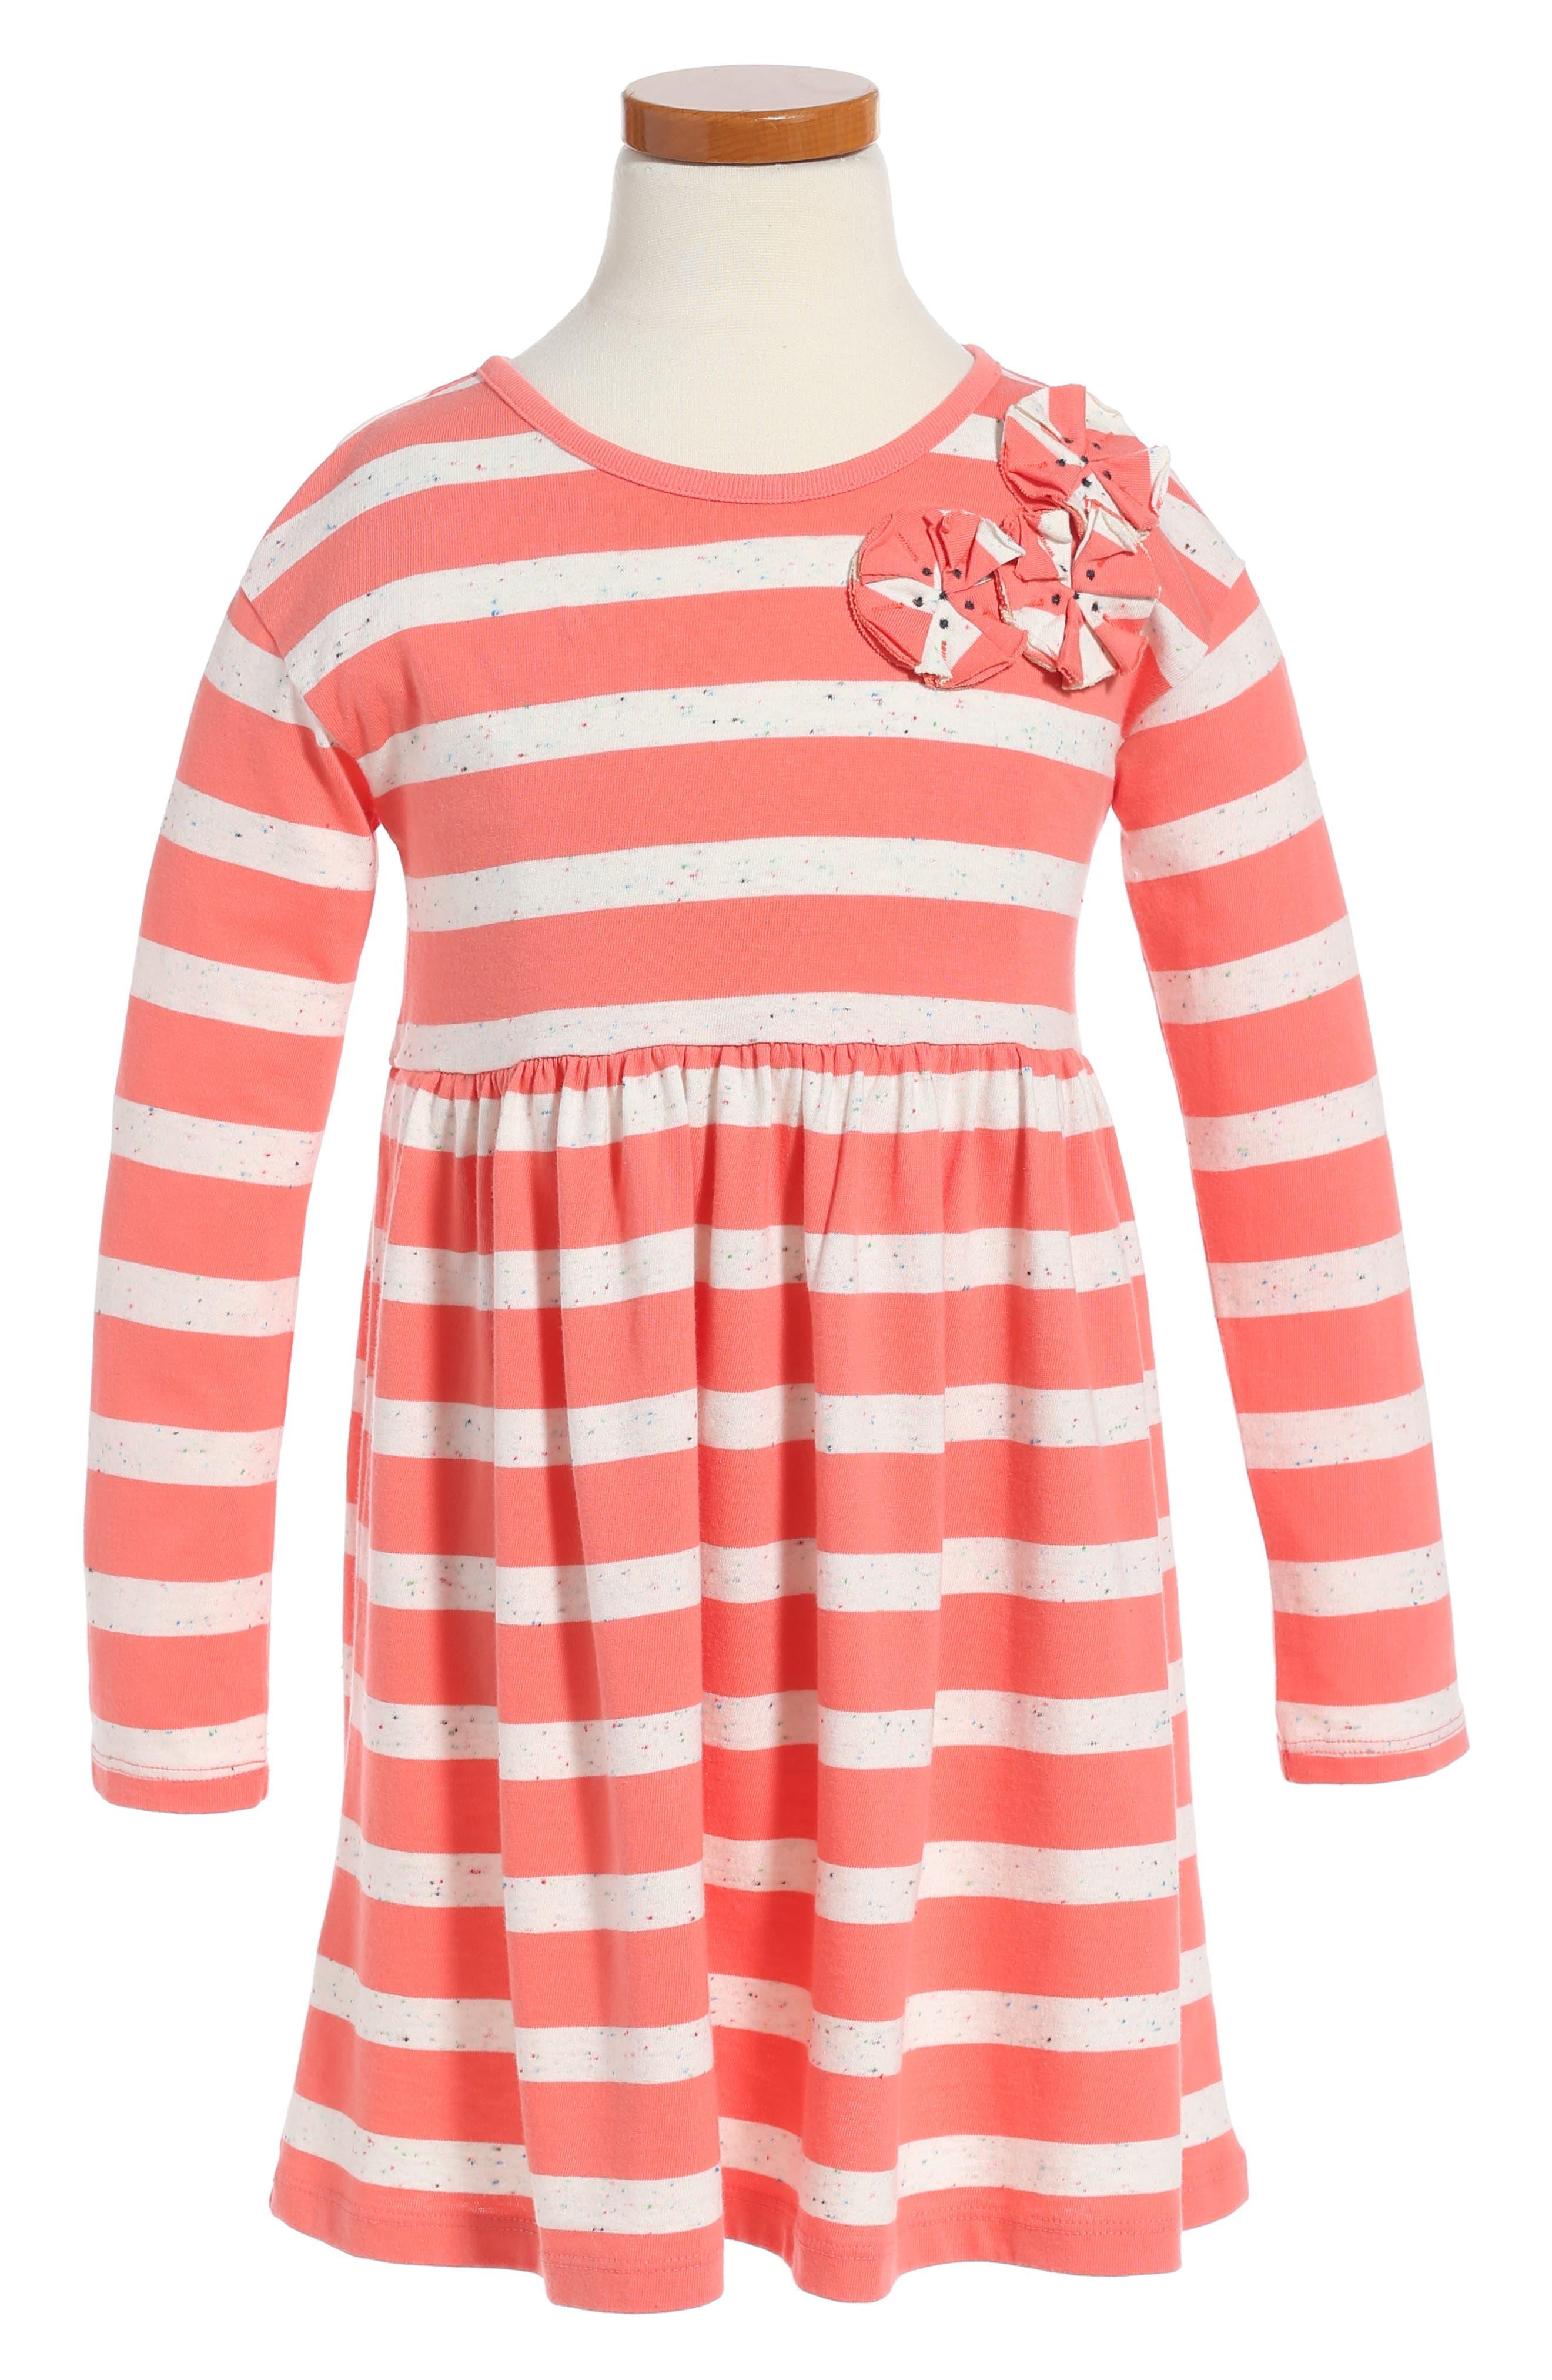 Saorsa Appliqué Dress,                             Main thumbnail 1, color,                             Orange Buoy